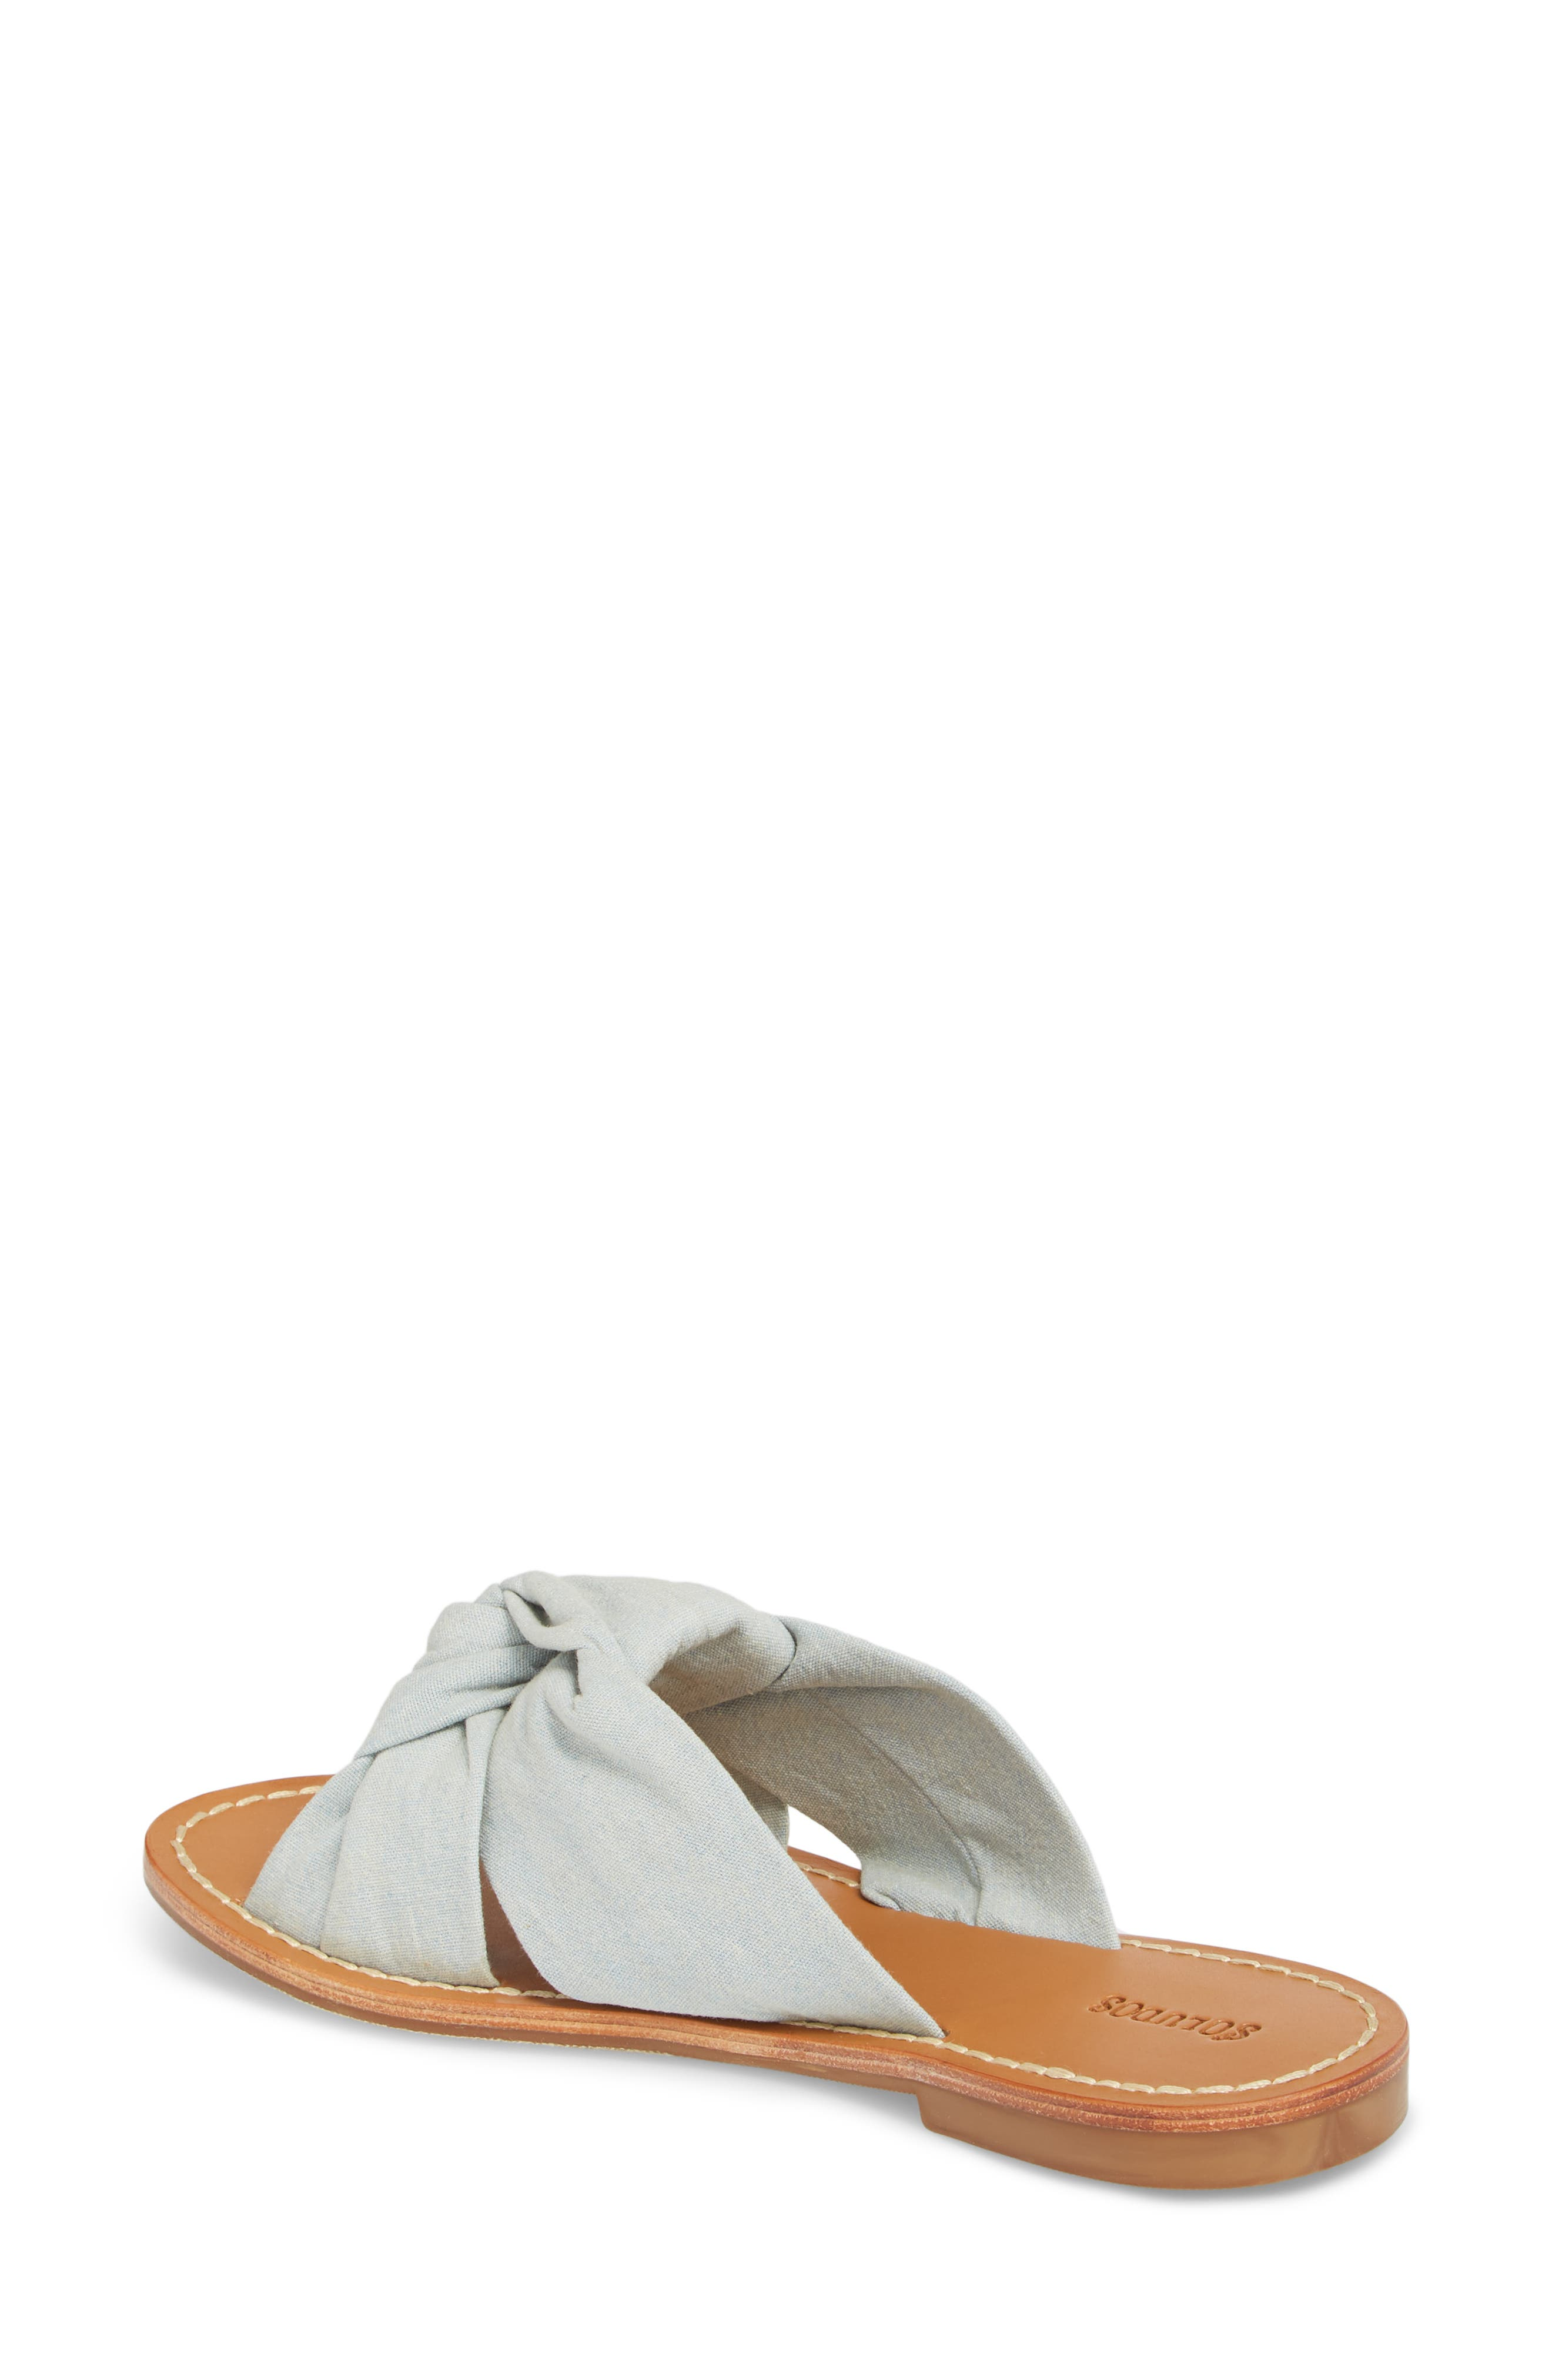 Knotted Slide Sandal,                             Alternate thumbnail 2, color,                             420